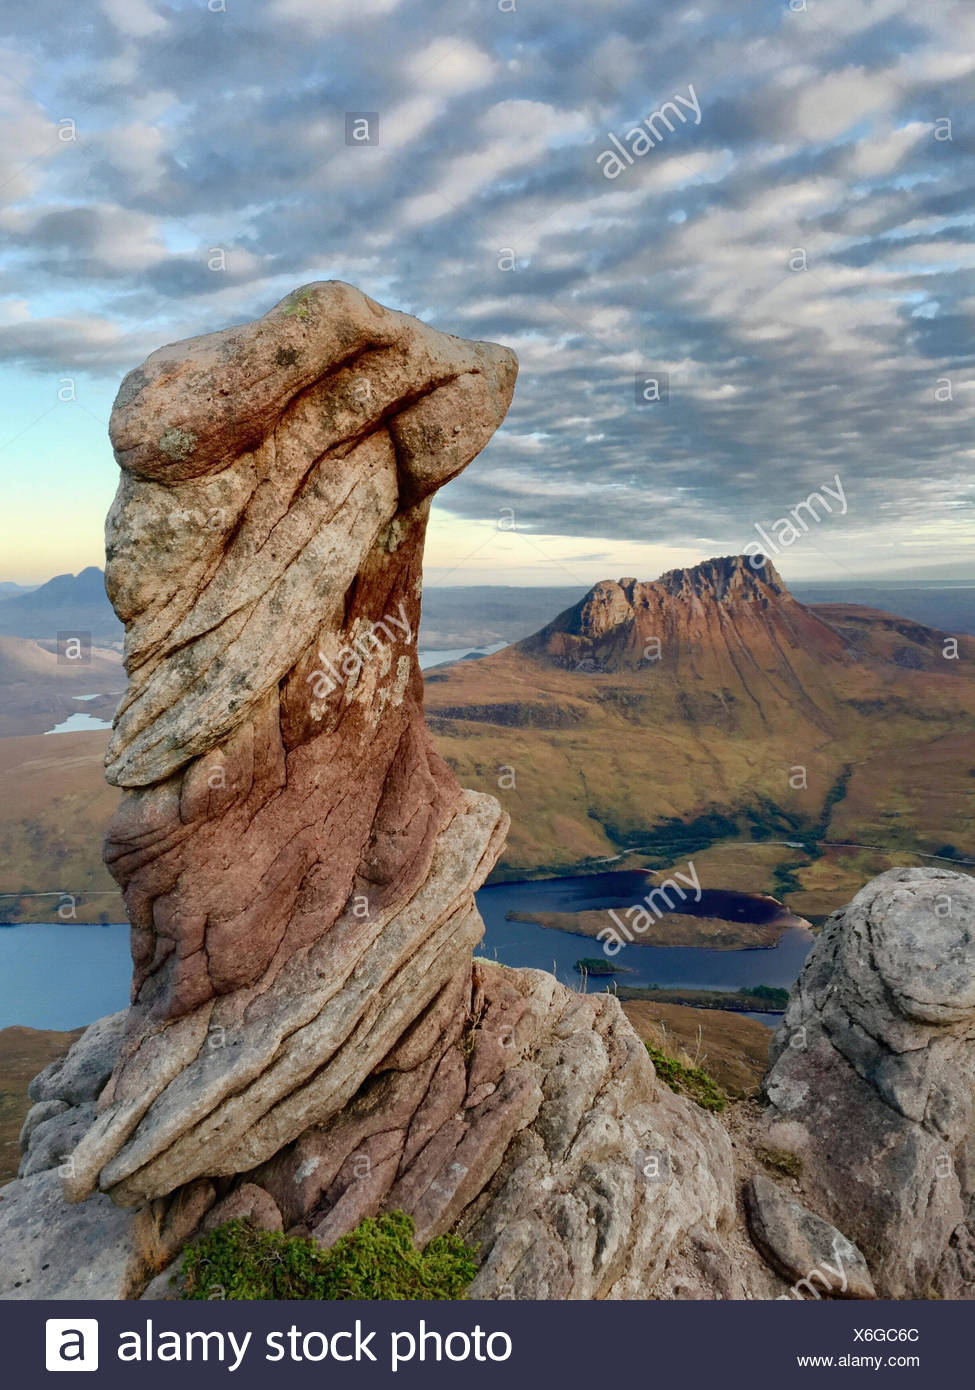 Sgorr Tuath, a peak in the northwest of Scotland. - Stock Image